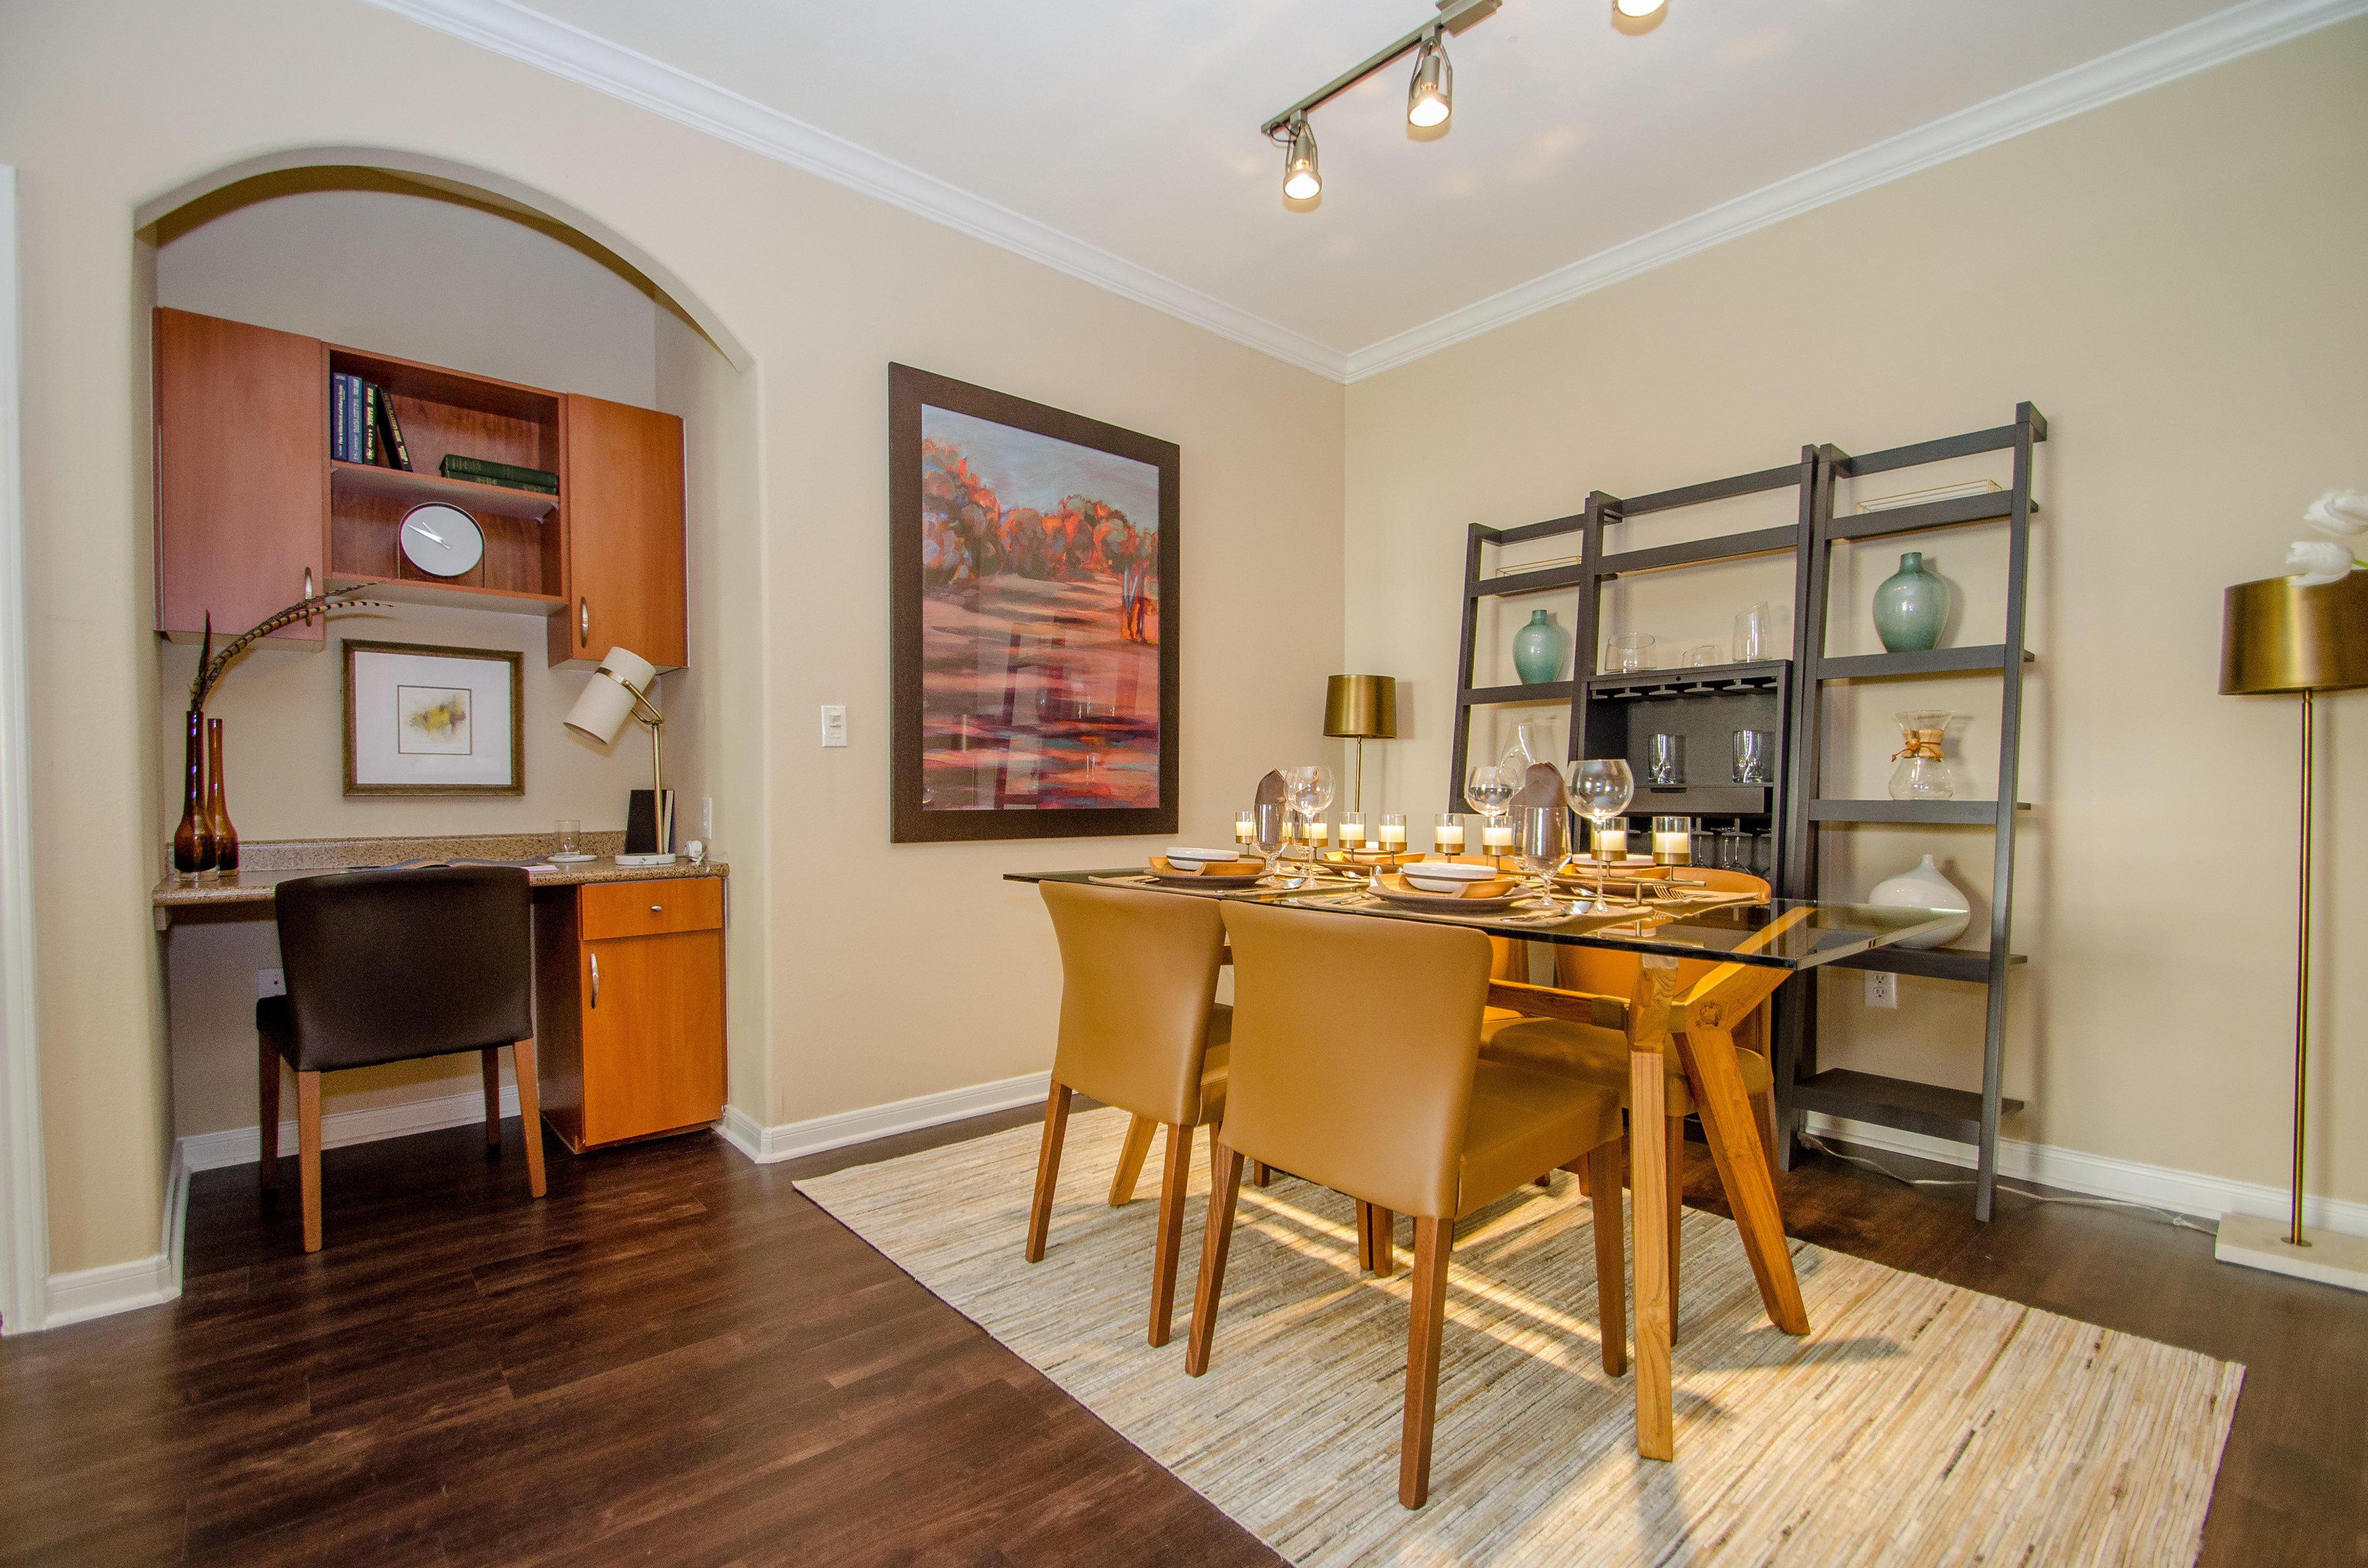 Apartment Rental Agency in TX Houston 77099 Advenir at Milan 13100 W Bellfort Ave  (281)495-6646